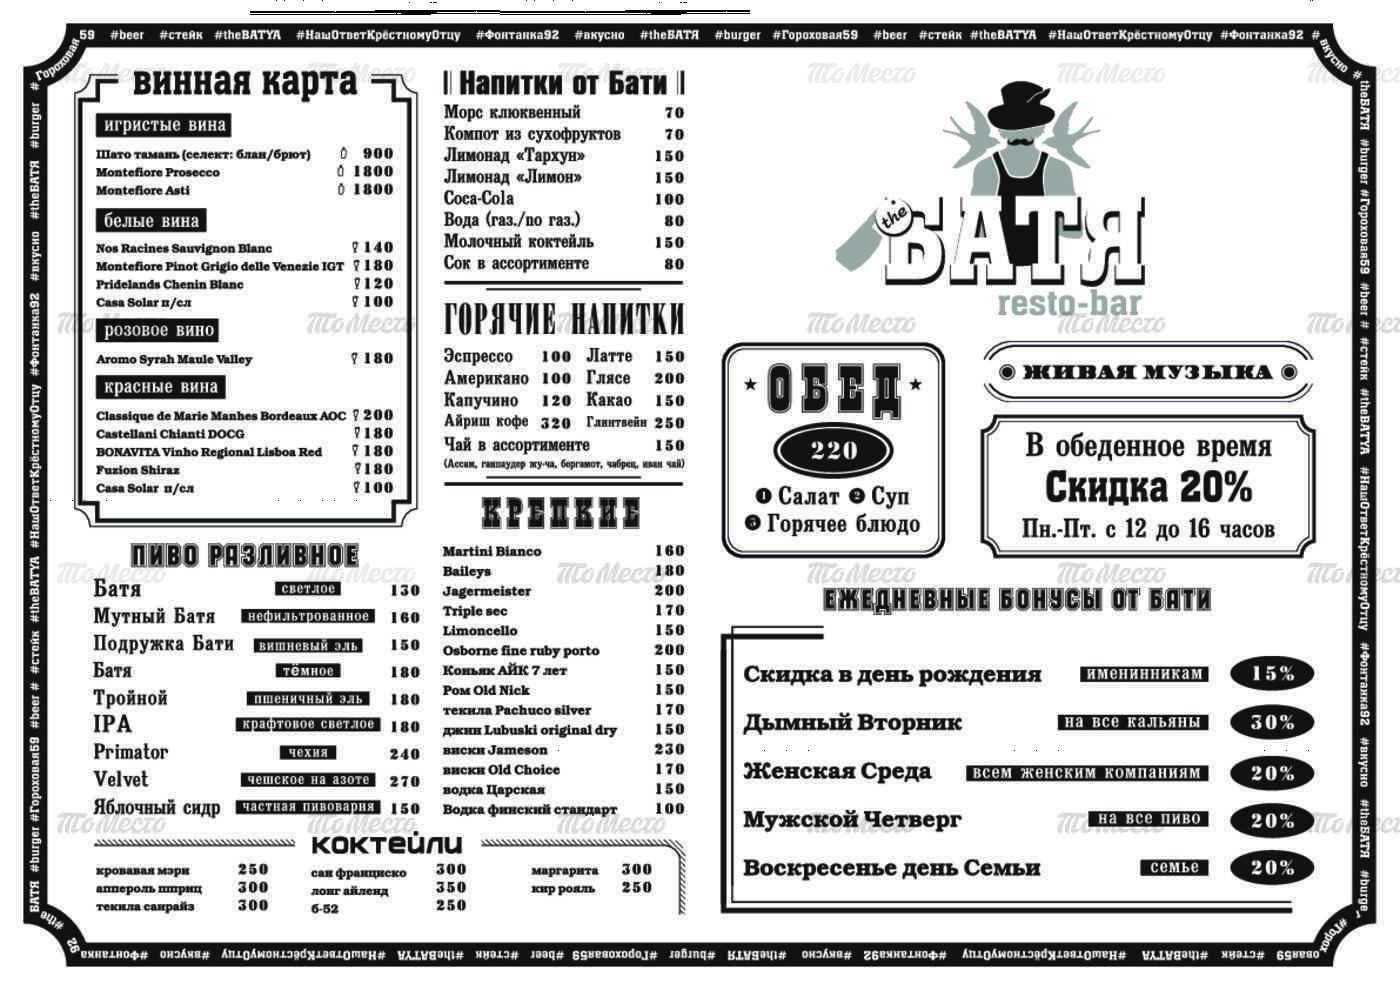 Меню ресторана The Батя (The Batya) на набережной реки Фонтанки фото 2